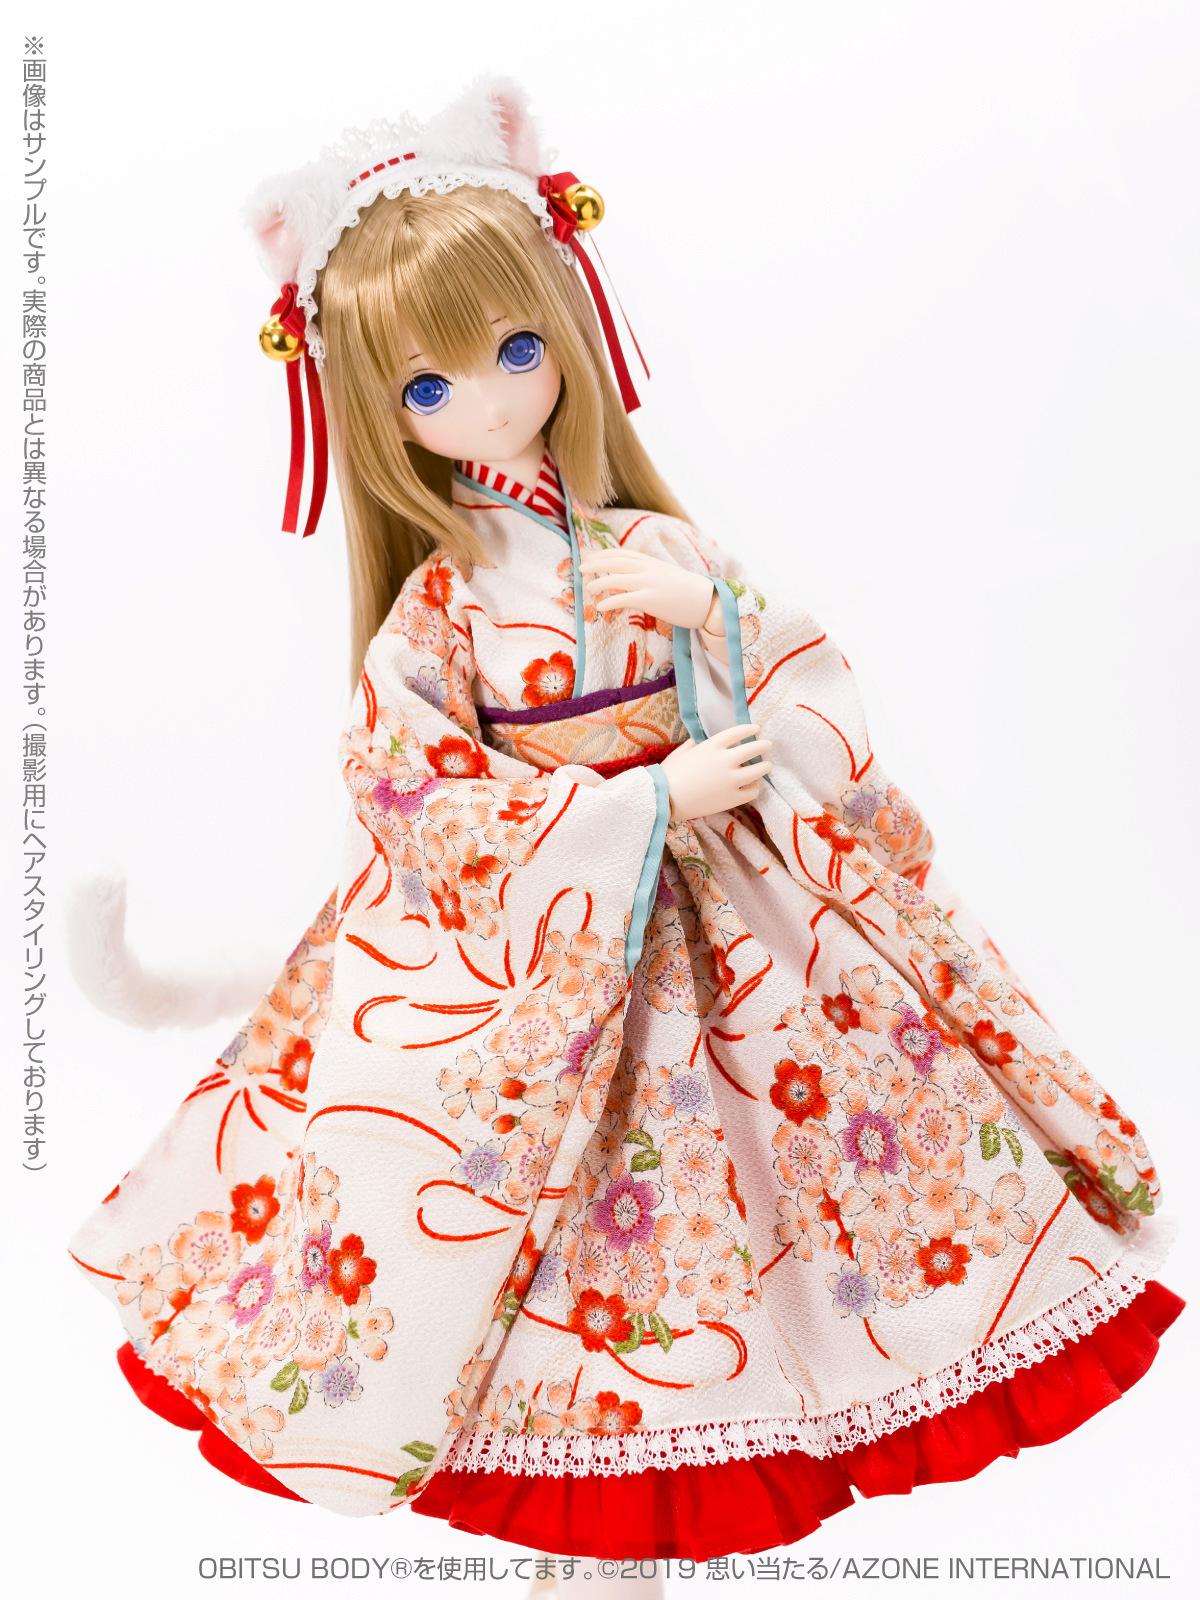 [Azone] 1/3 Ellen Time of eternal VI Taisho Roman White Cat Rondo / Alice Time of grace IV Taisho Roman Black cat Rondo  45731944